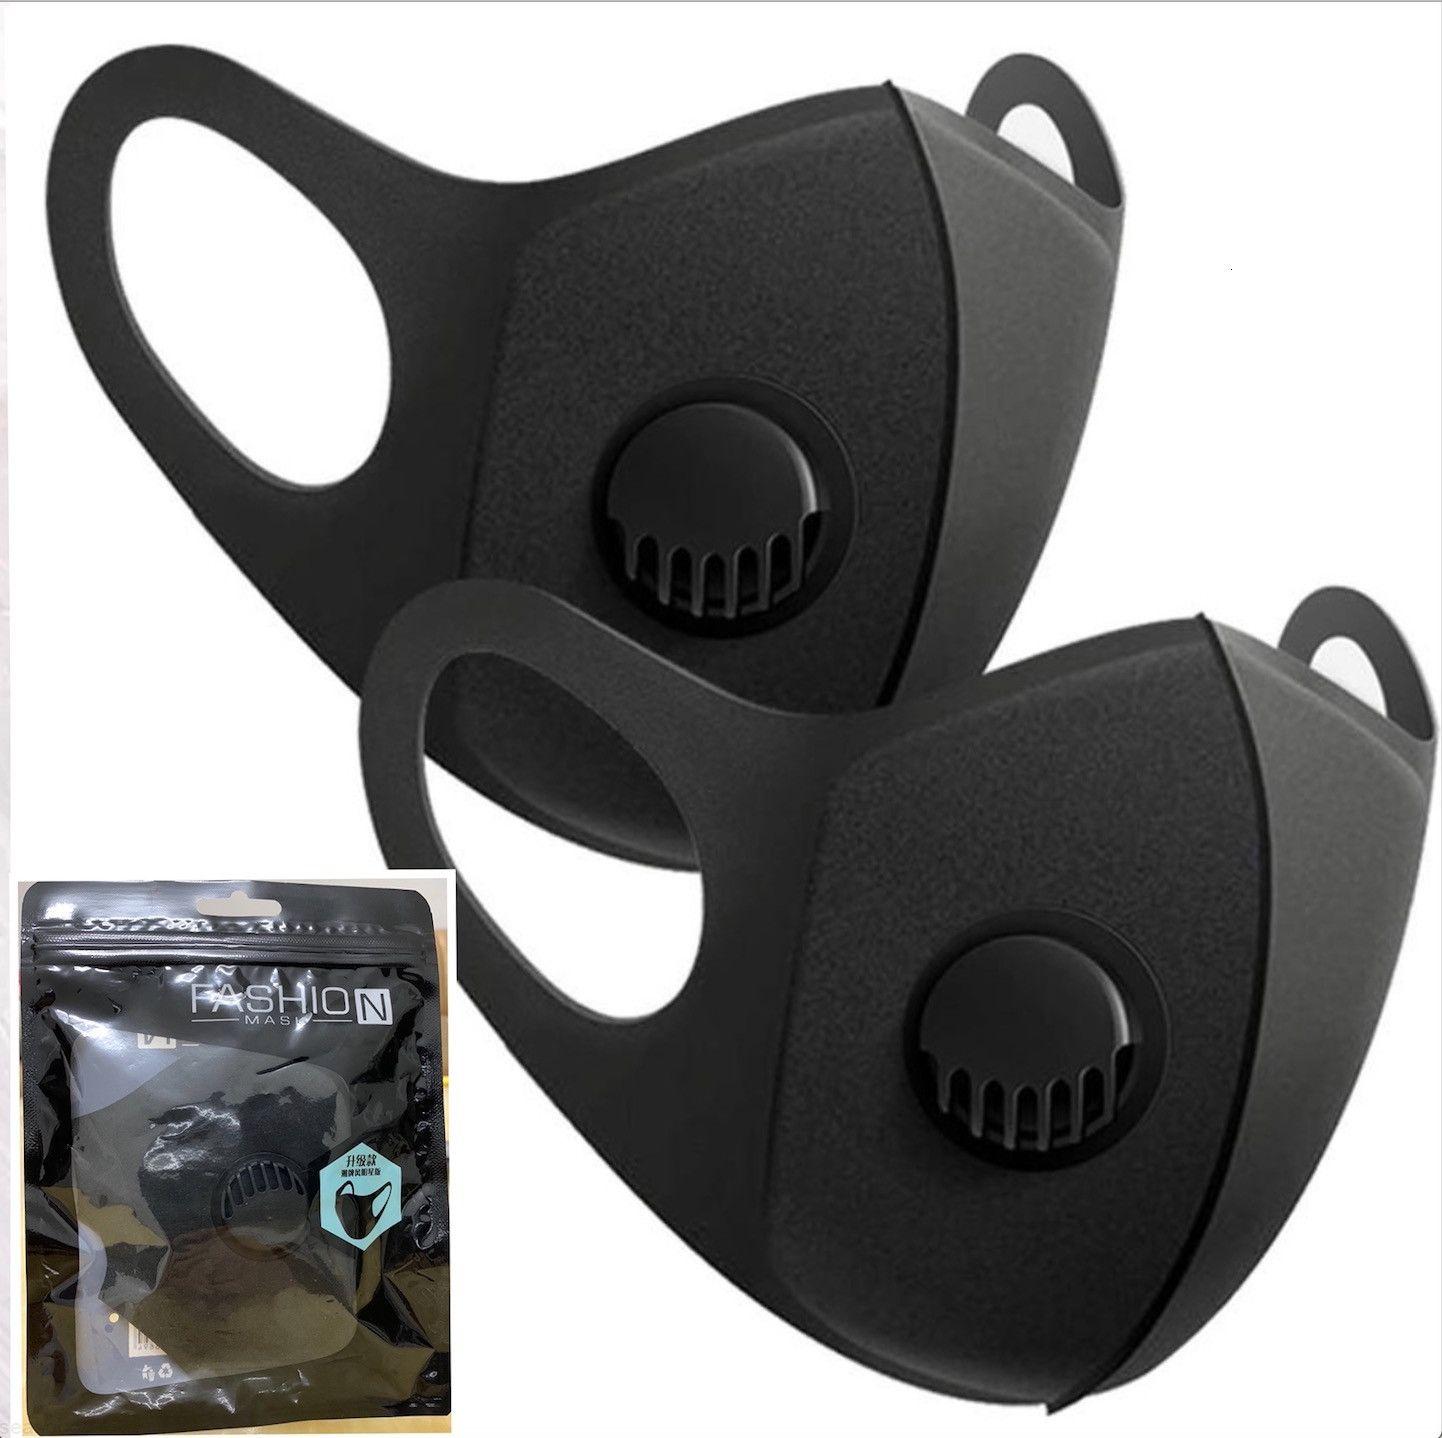 Breathing Filter with Designer Valves Air Face Washable Mask Reusable Adult Masks Sponge Black Protective Face Mask with Fashion packing